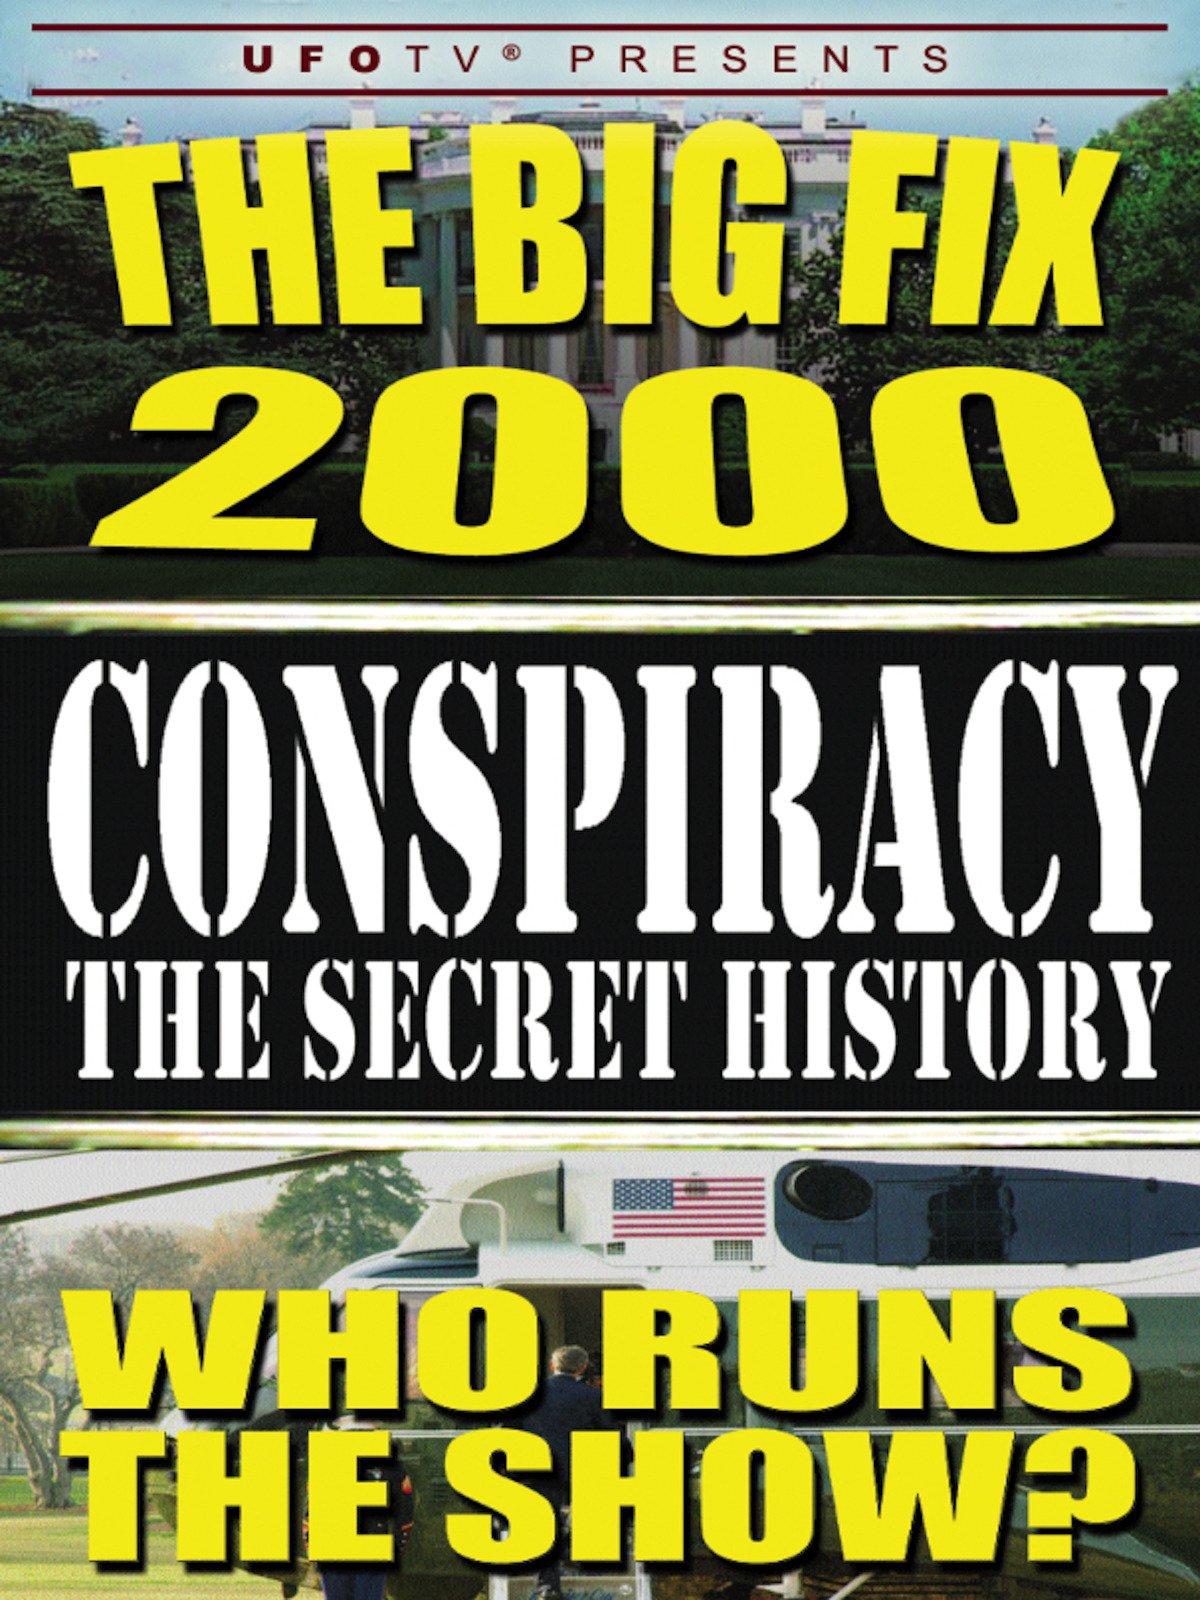 Conspiracy The Secret History: The Big Fix 2000